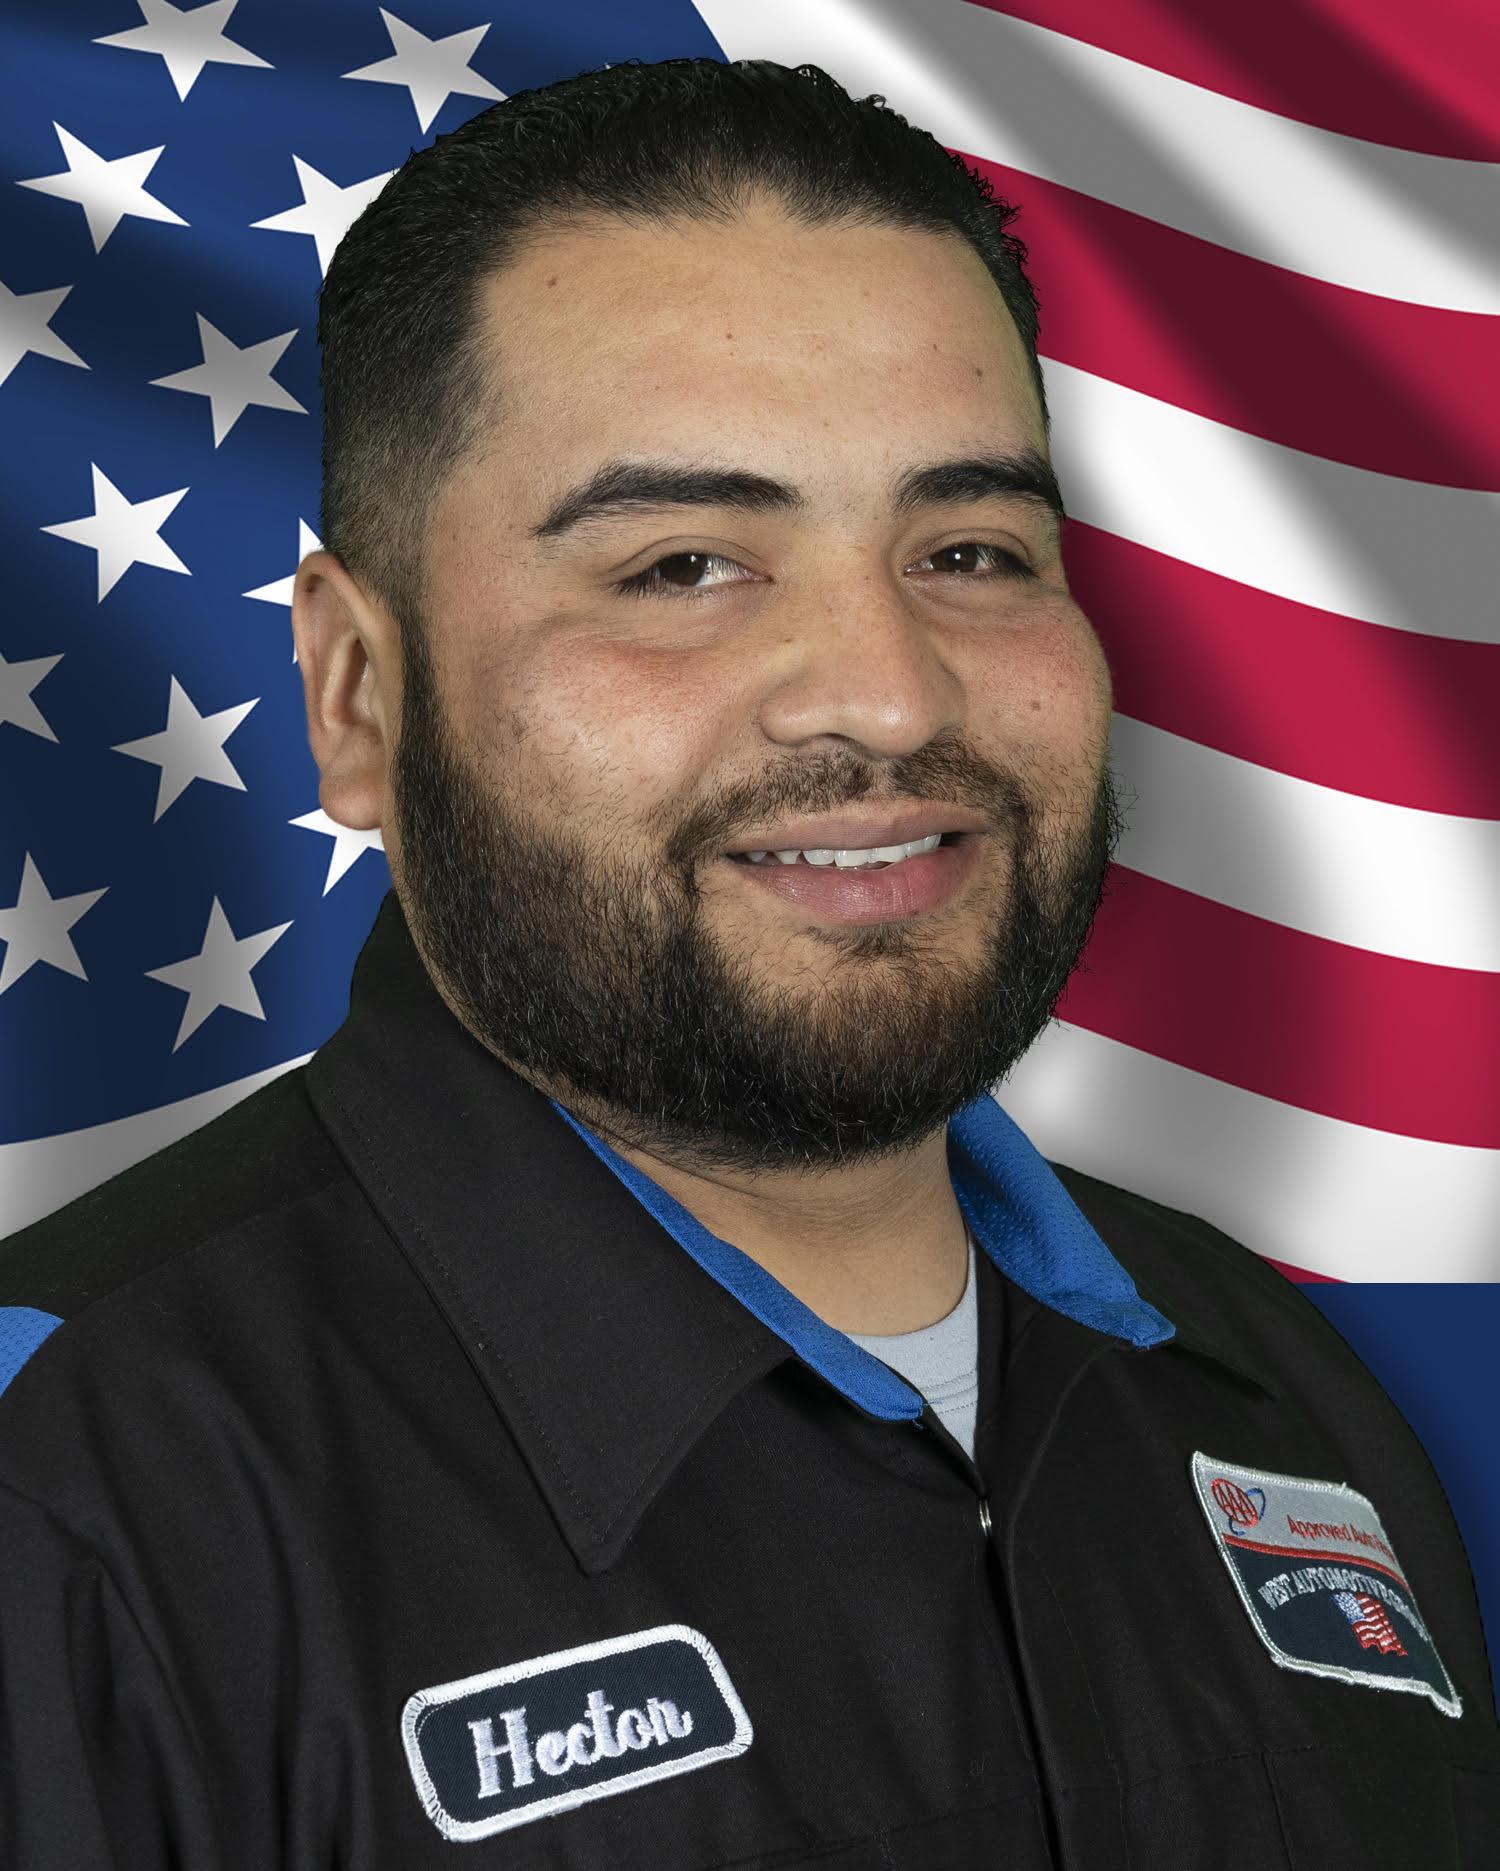 Hector Perez